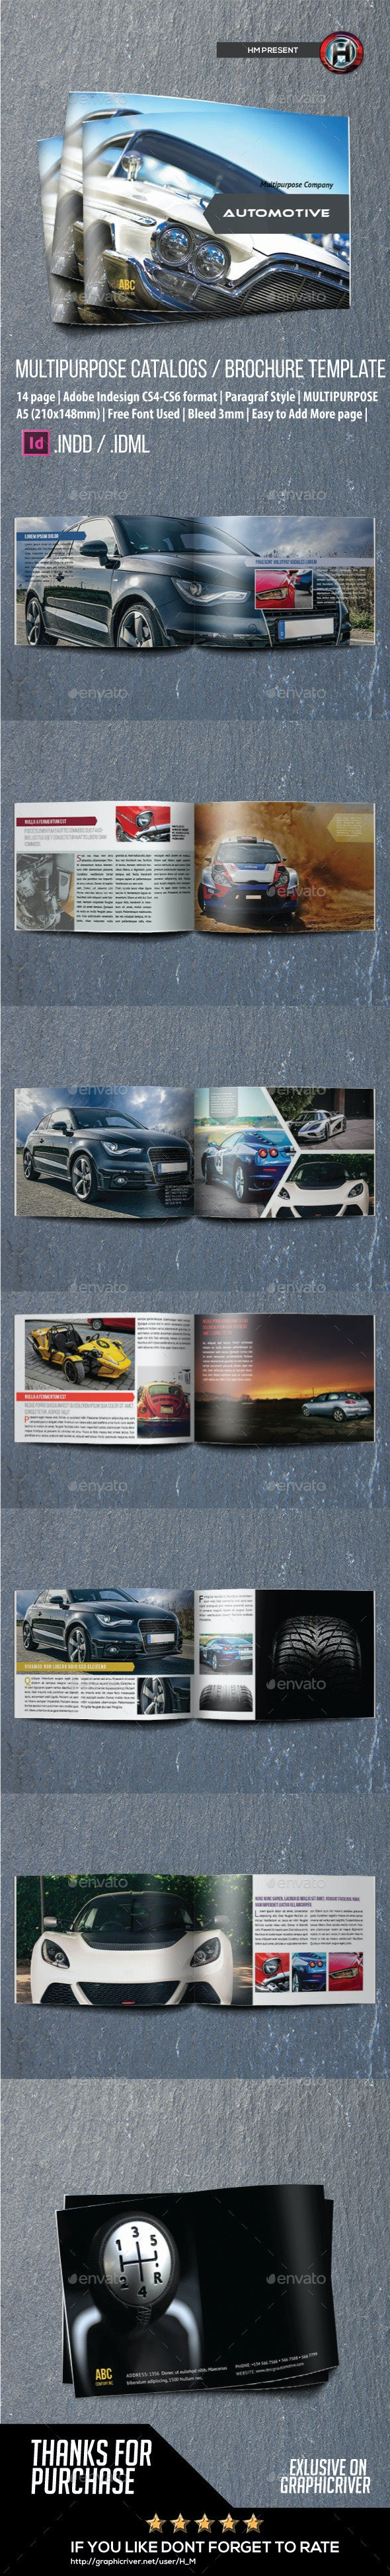 Automotive Catalog Brochure Indesign Template - Catalogs Brochures